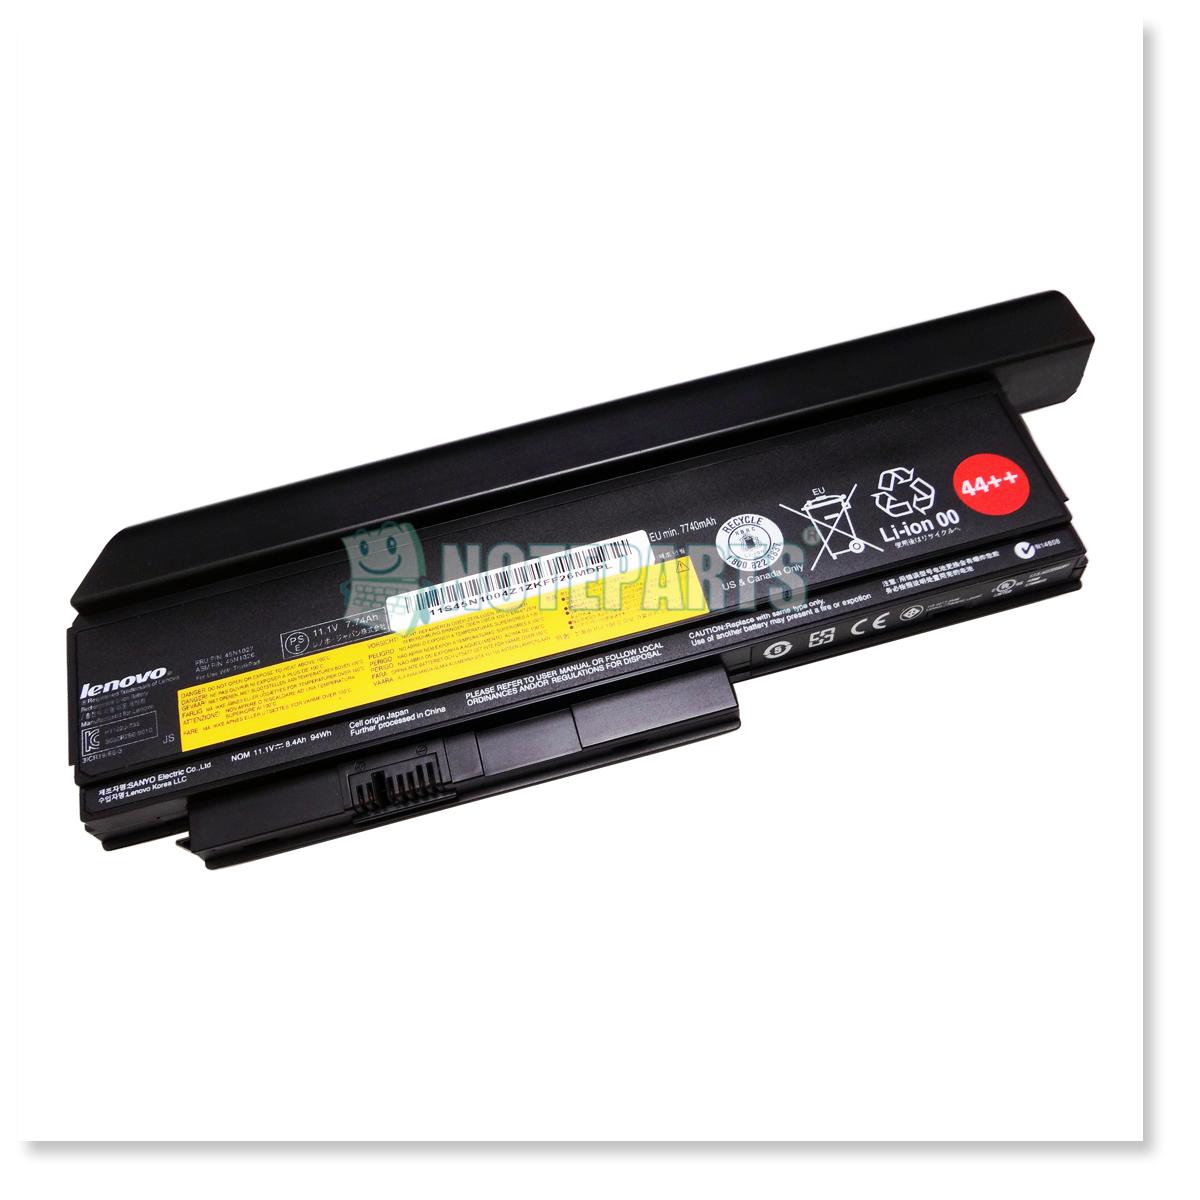 Lenovo純正 レノボ ThinkPad バッテリー 44++ (9セル) X230 0A36307